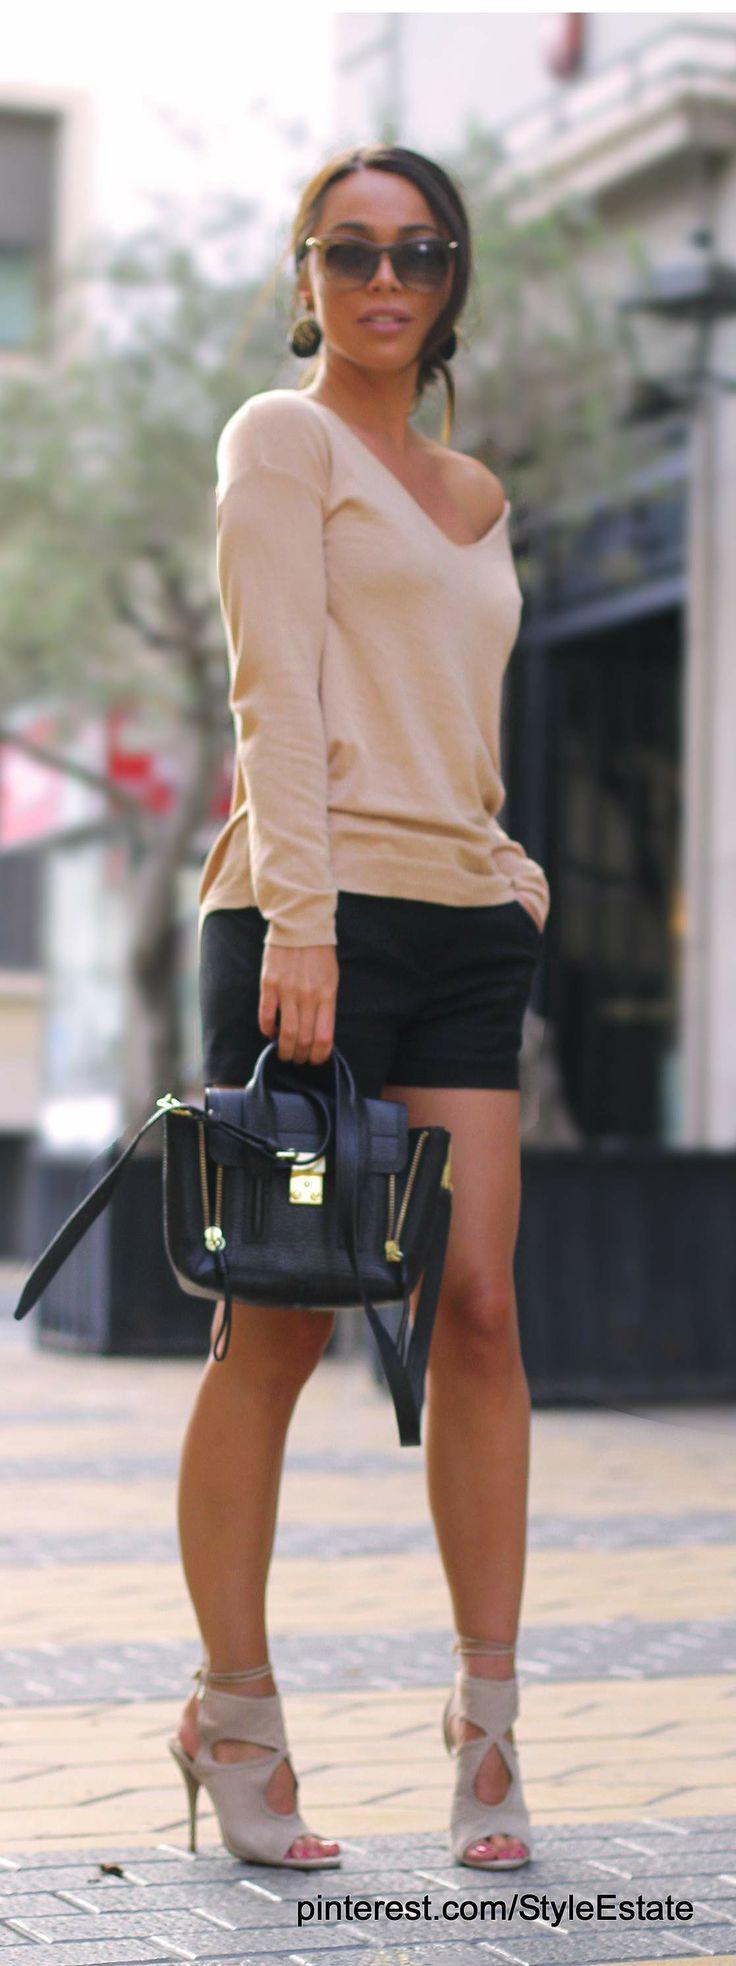 Bershka nude sweater and black Zara shorts + Aquazzura heels